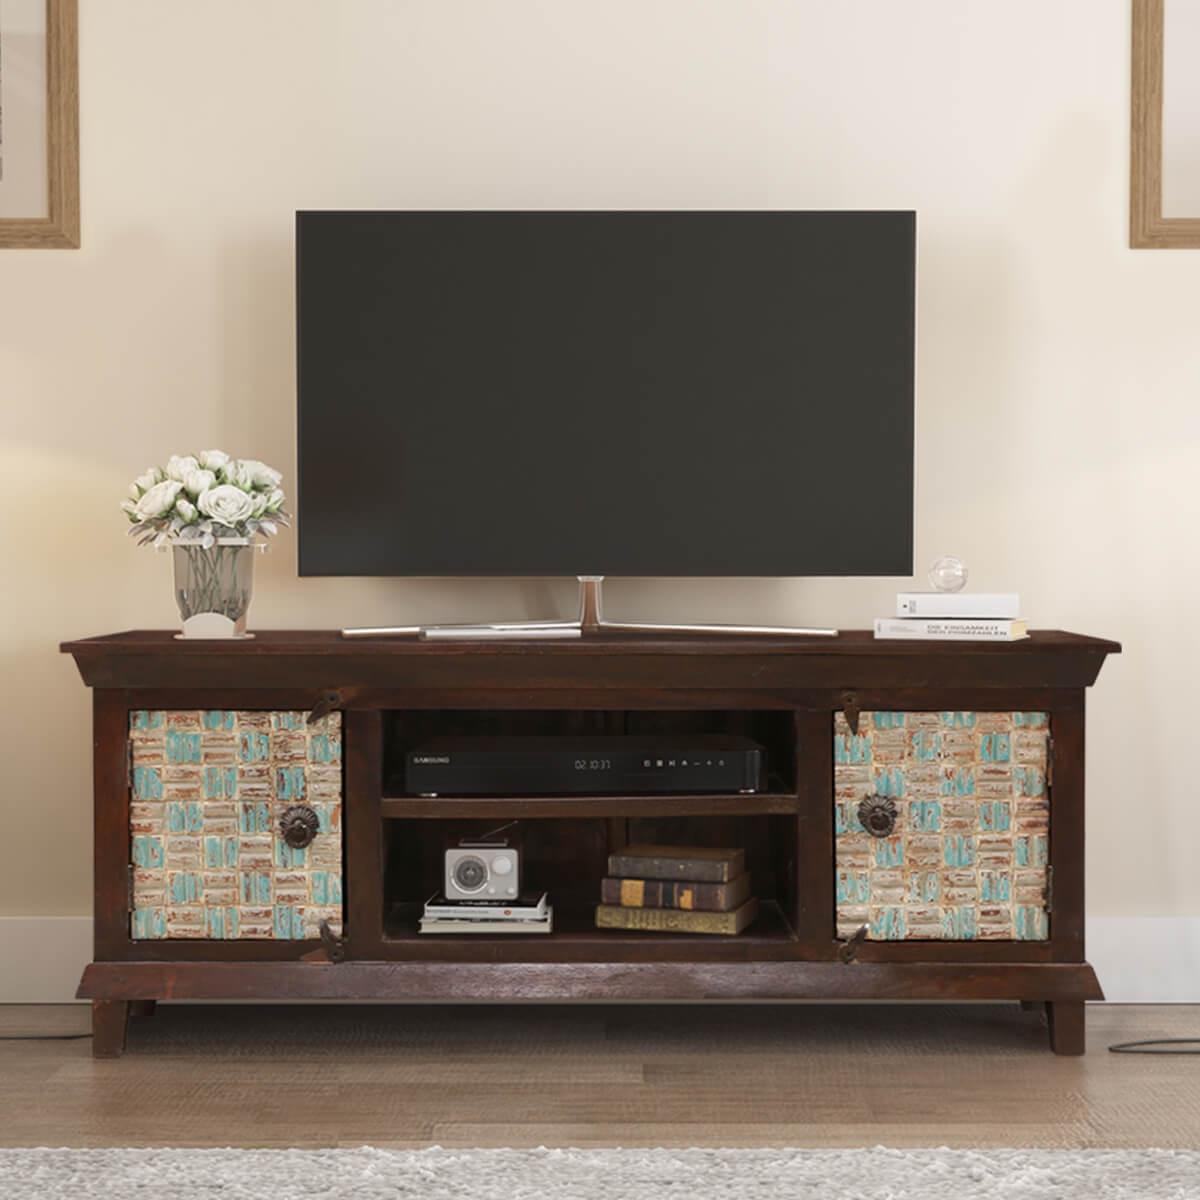 Pretoria Antique Solid Wood TV Media Stand